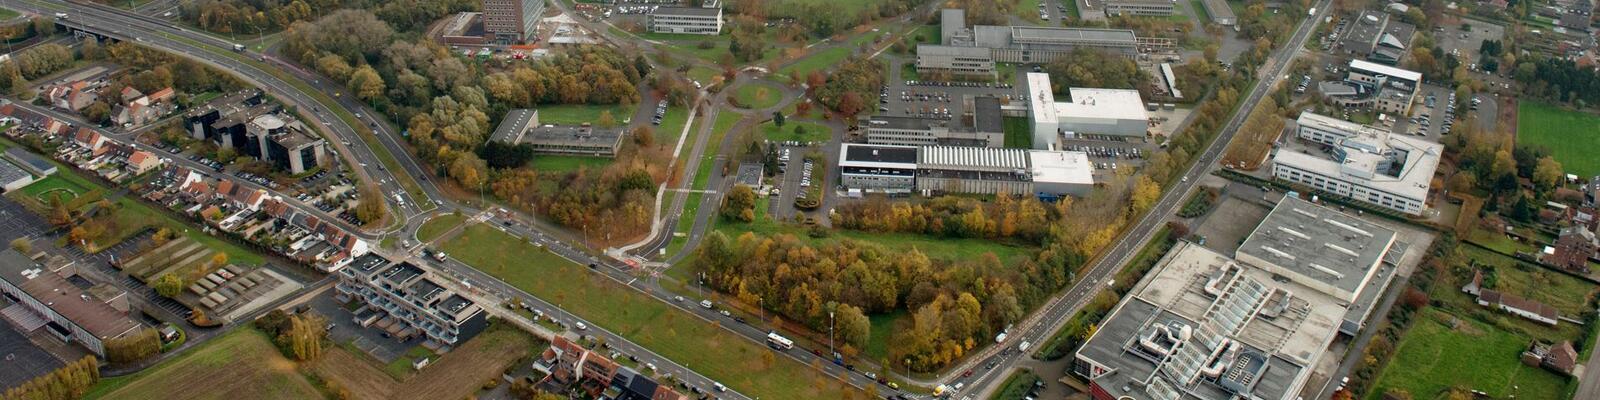 Technologiepark Ardoyen - Tech lane park - copy-Ugent